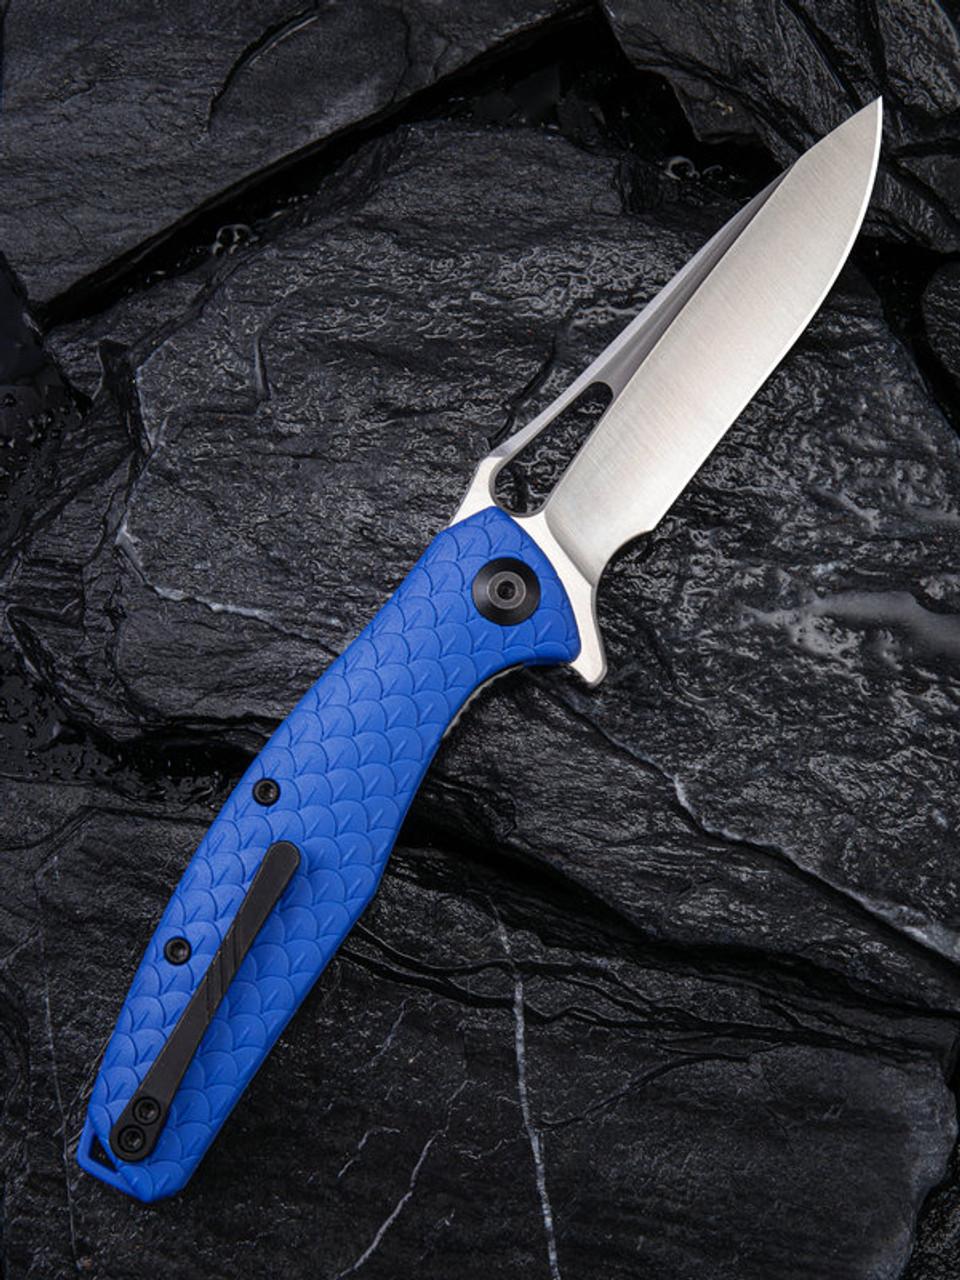 "Civivi Wyvern Linerlock Folder C902E, 3.45"" D2 Drop Point Plain Blade, Blue Fiber-glass Reinforced Nylon Handle"